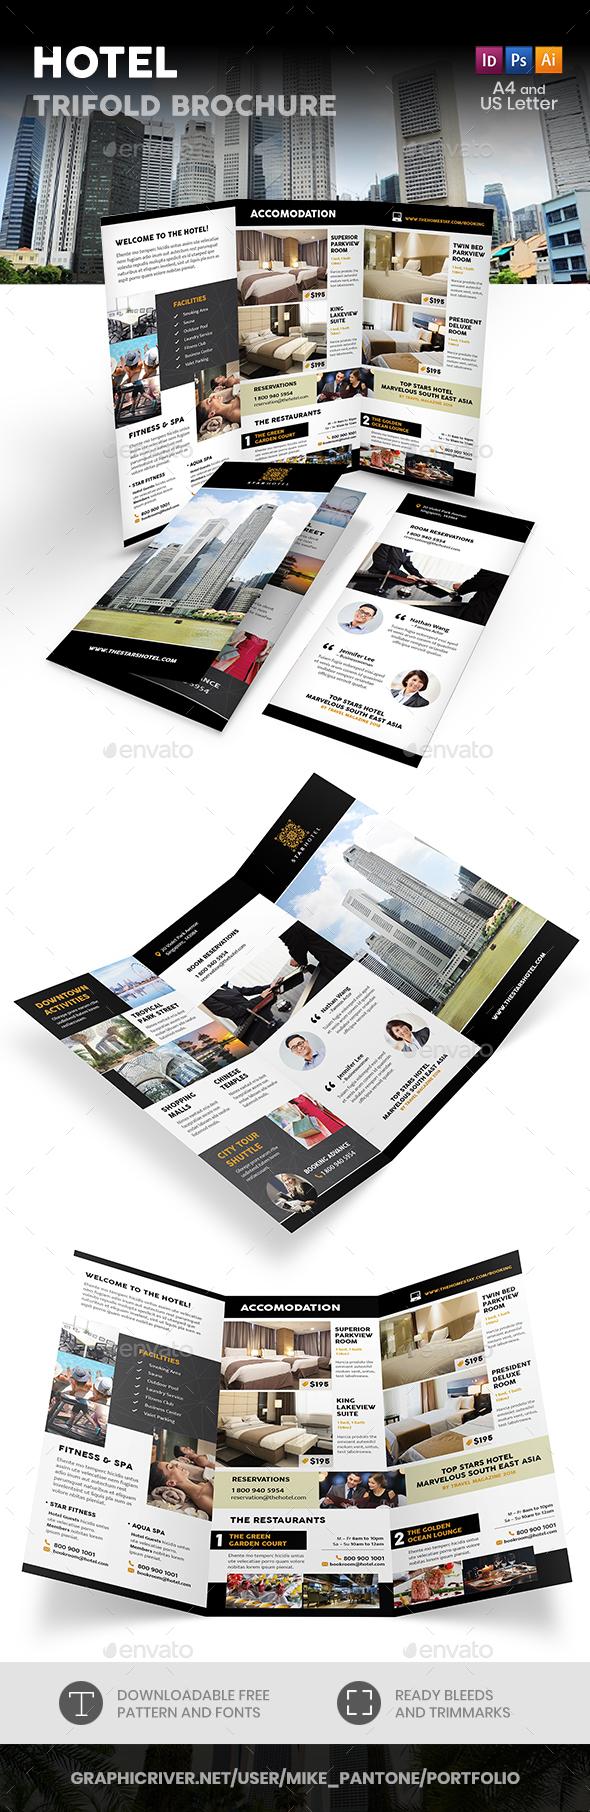 Hotel Trifold Brochure 8 - Informational Brochures